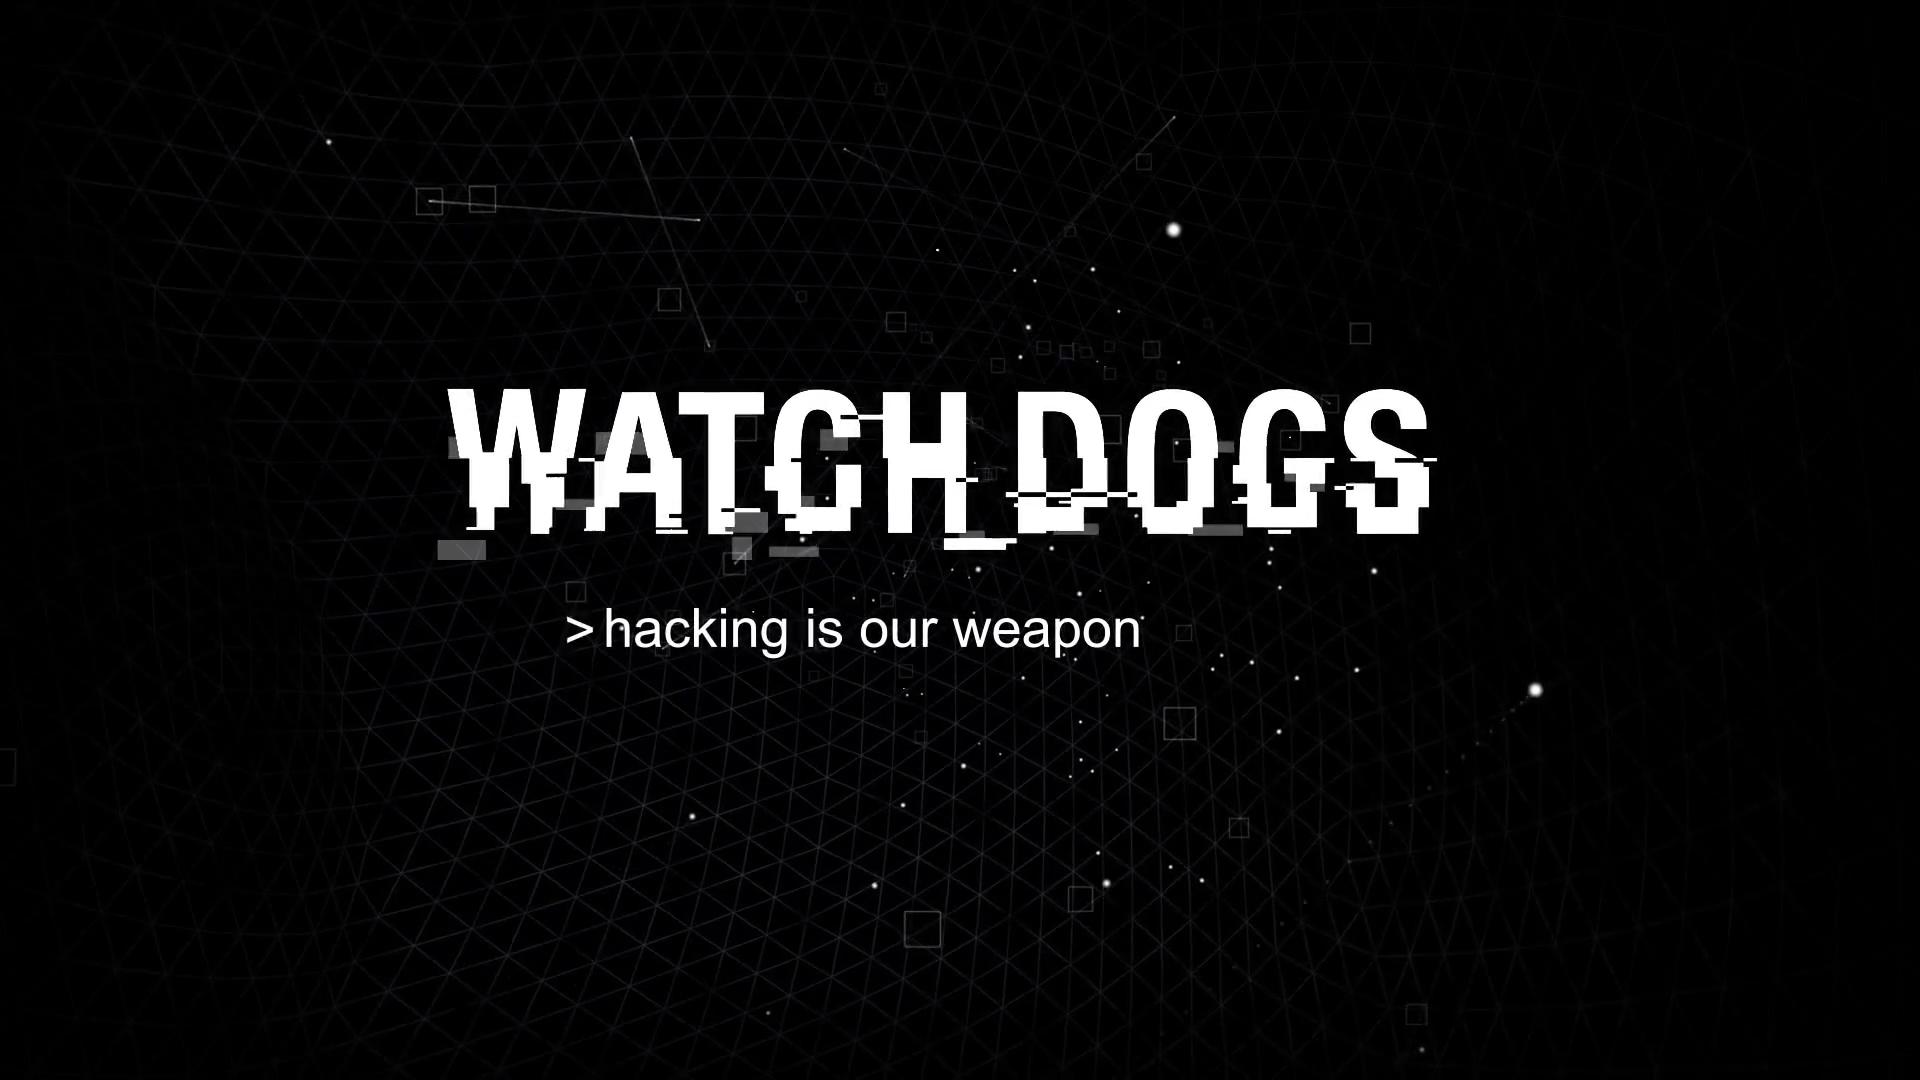 45] Watch Dogs Hacking Wallpaper on WallpaperSafari 1920x1080